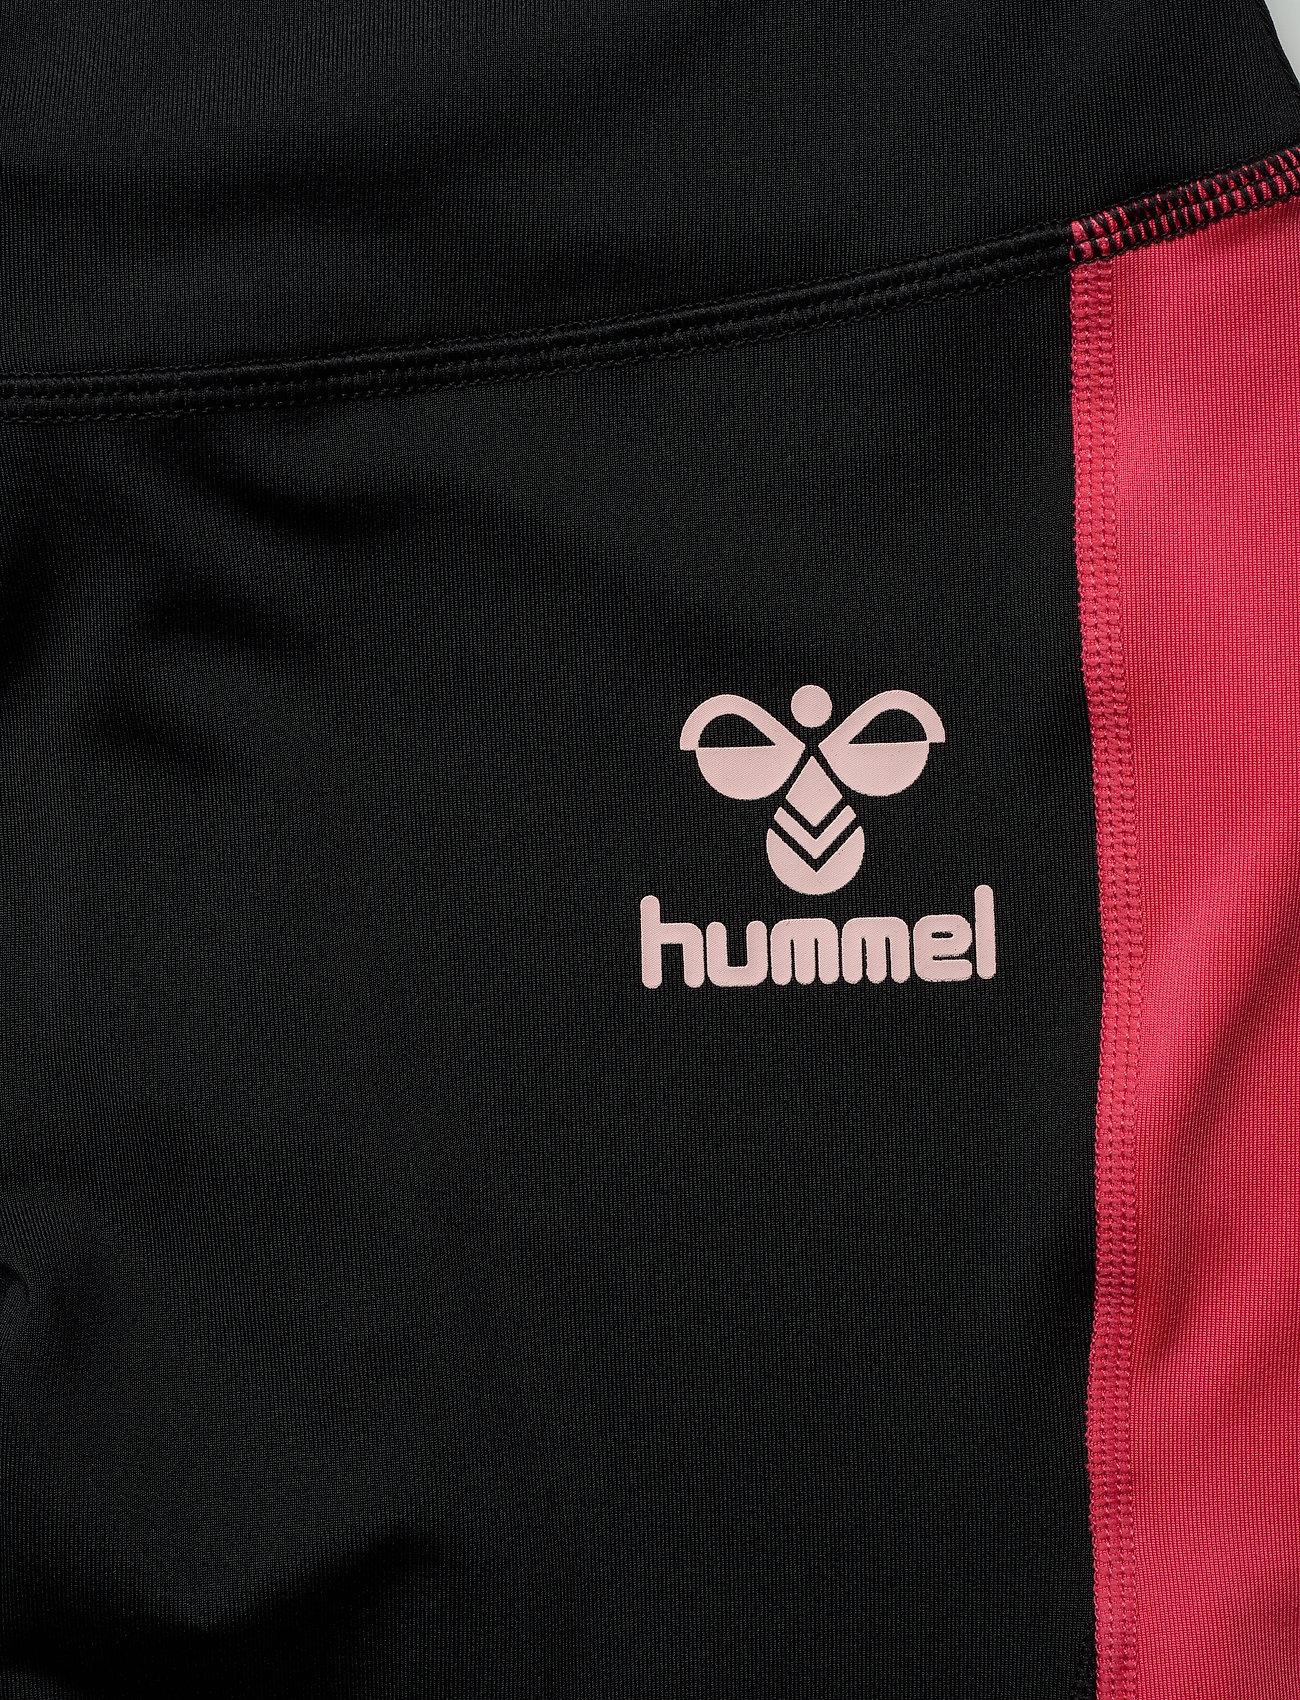 Hmloliza High Waist Tights (Cloud Pink/black) (32.47 €) - Hummel Uslf6